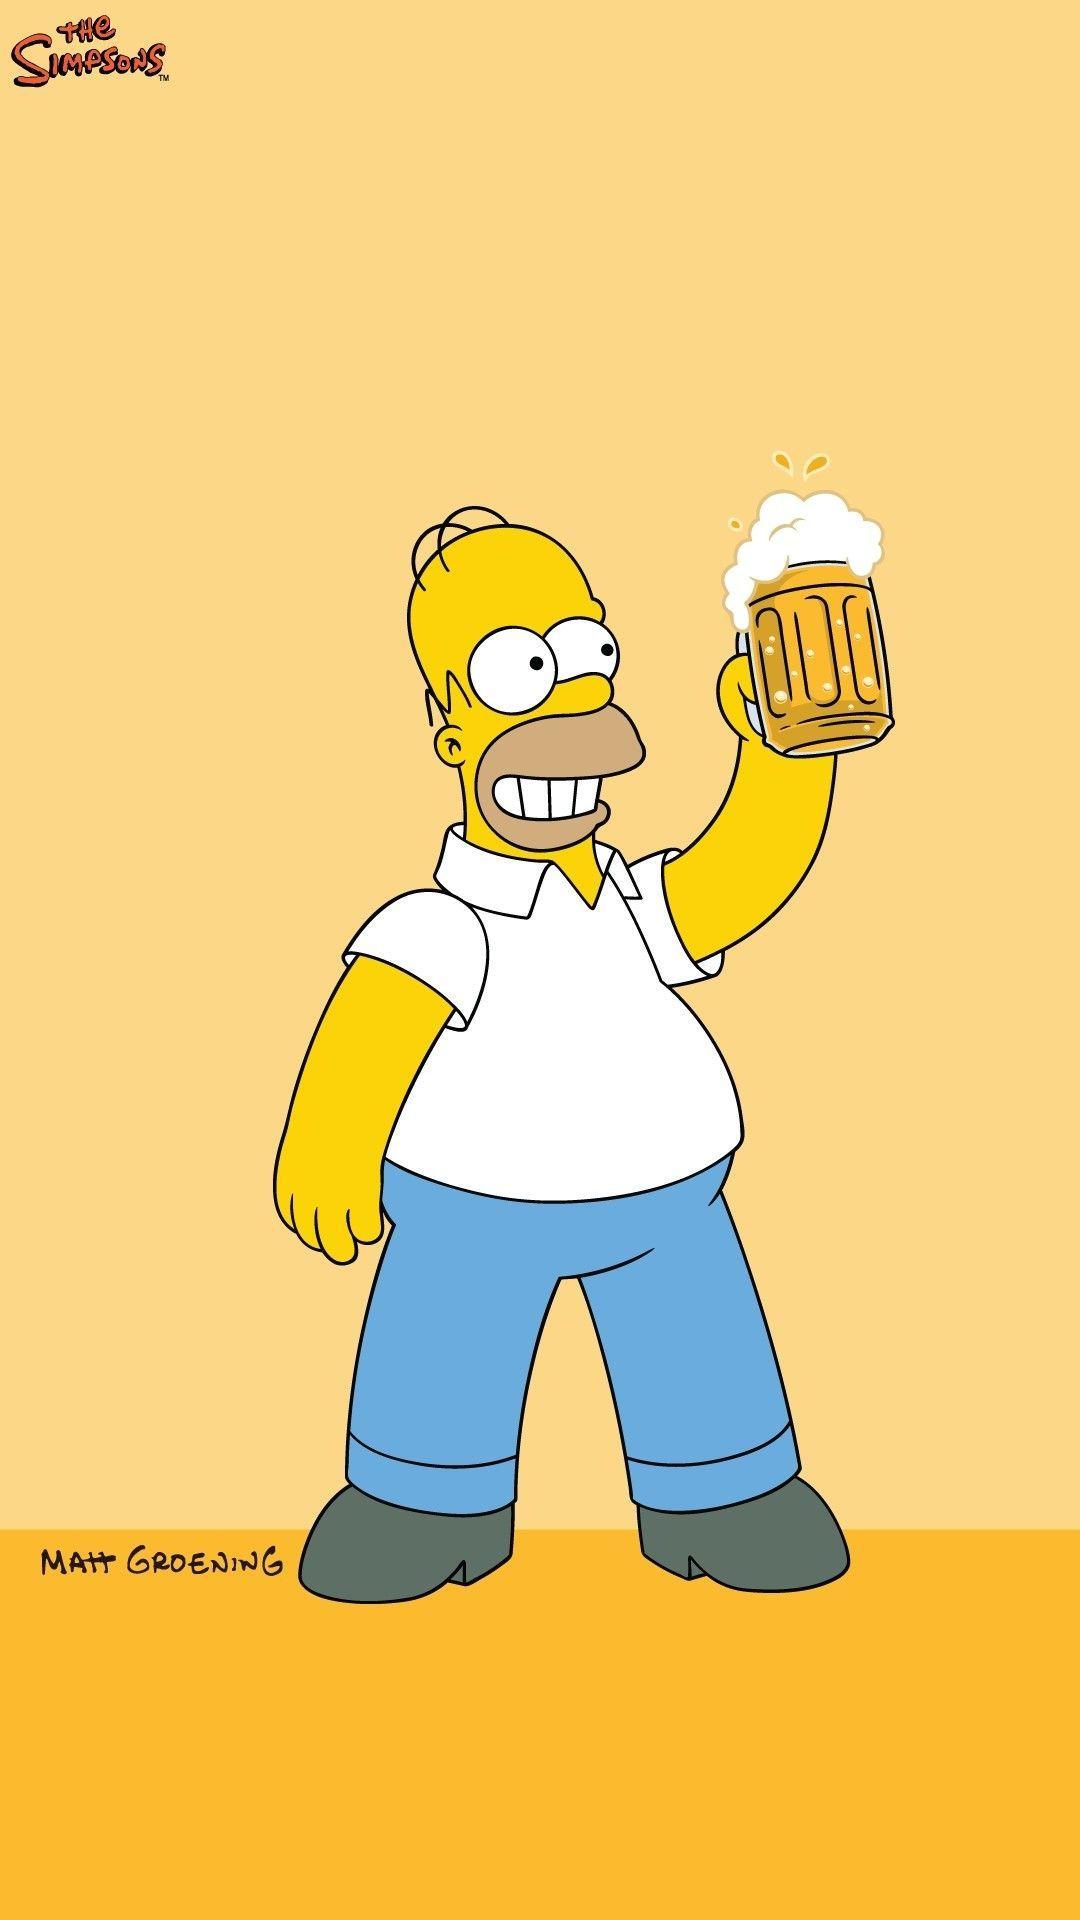 Homer Simpson Beer Quote 2001 Poster 25x35 Bananaroad Poster